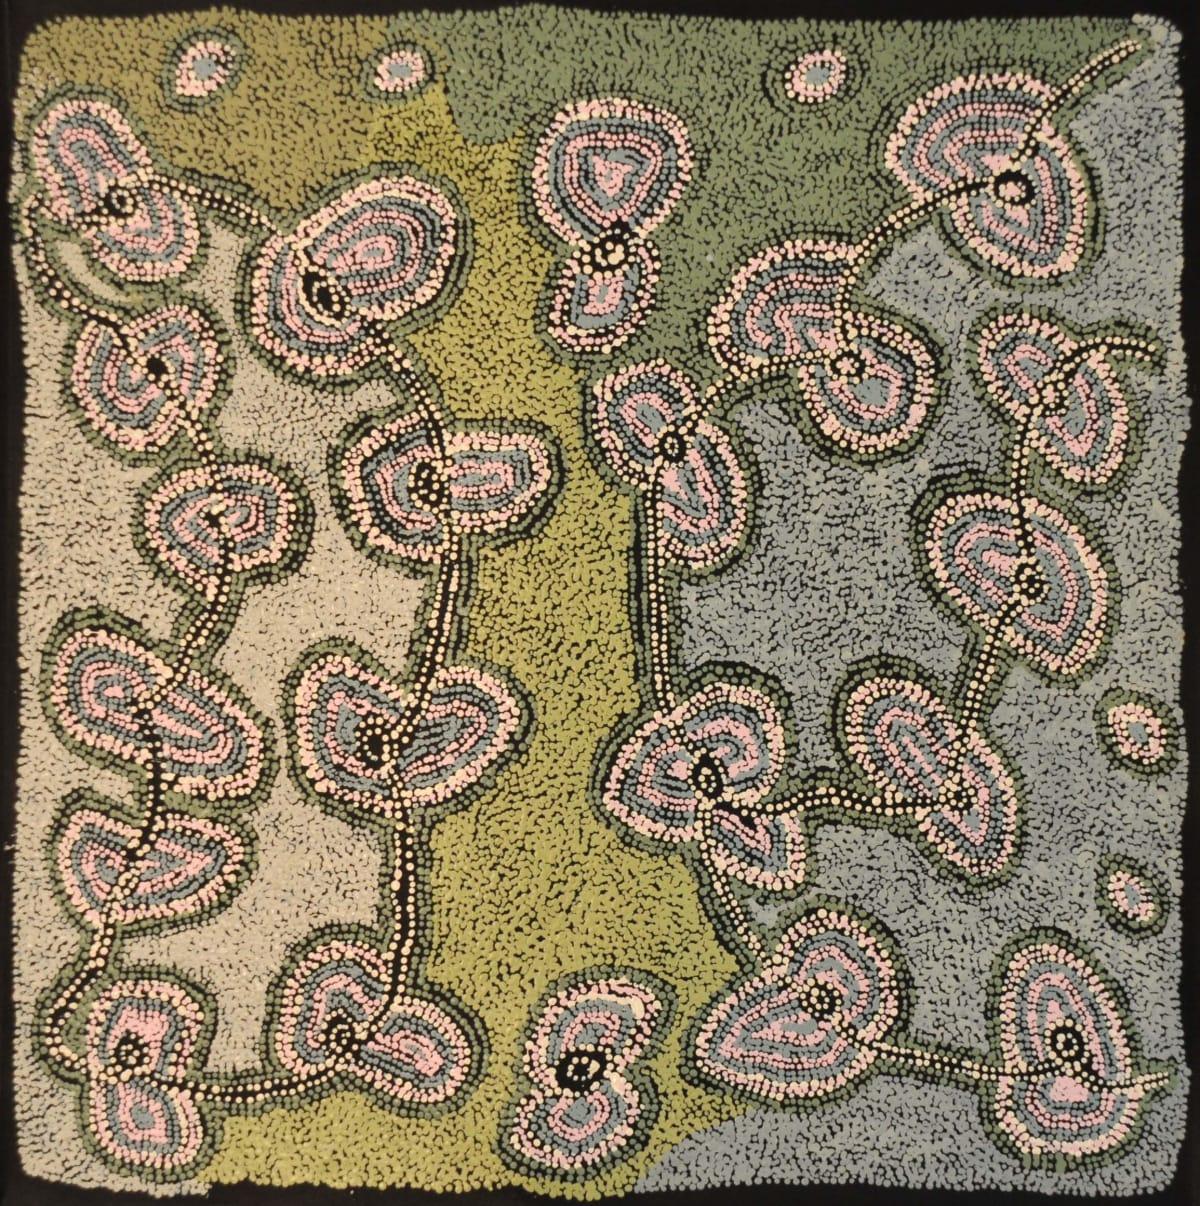 Tjariya (Nungalka) Stanley Minyma Kutjara acrylic on canvas 100 x 100 cm